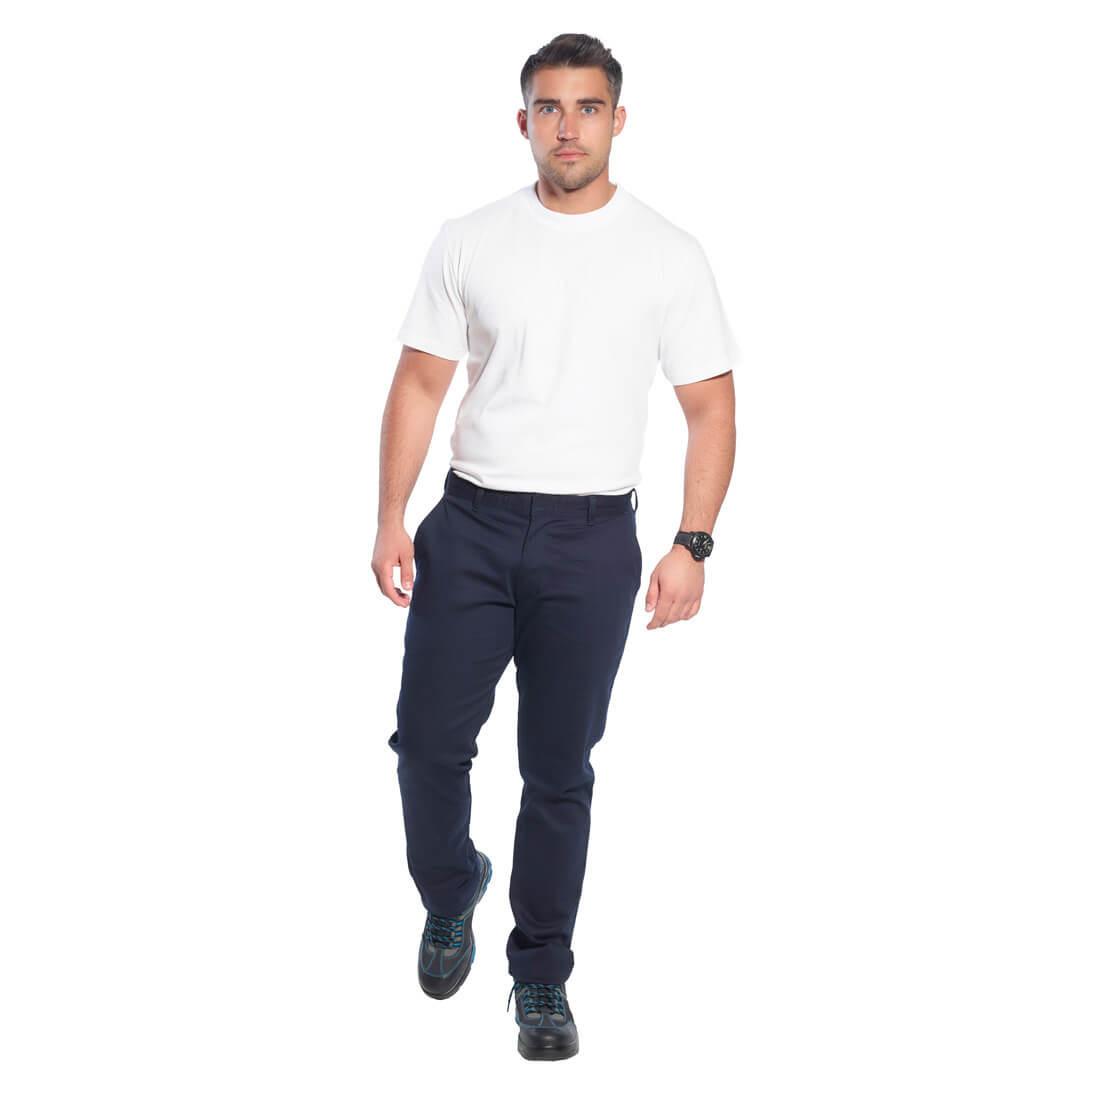 Pantaloni Chino Slim Strech - Imbracaminte de protectie